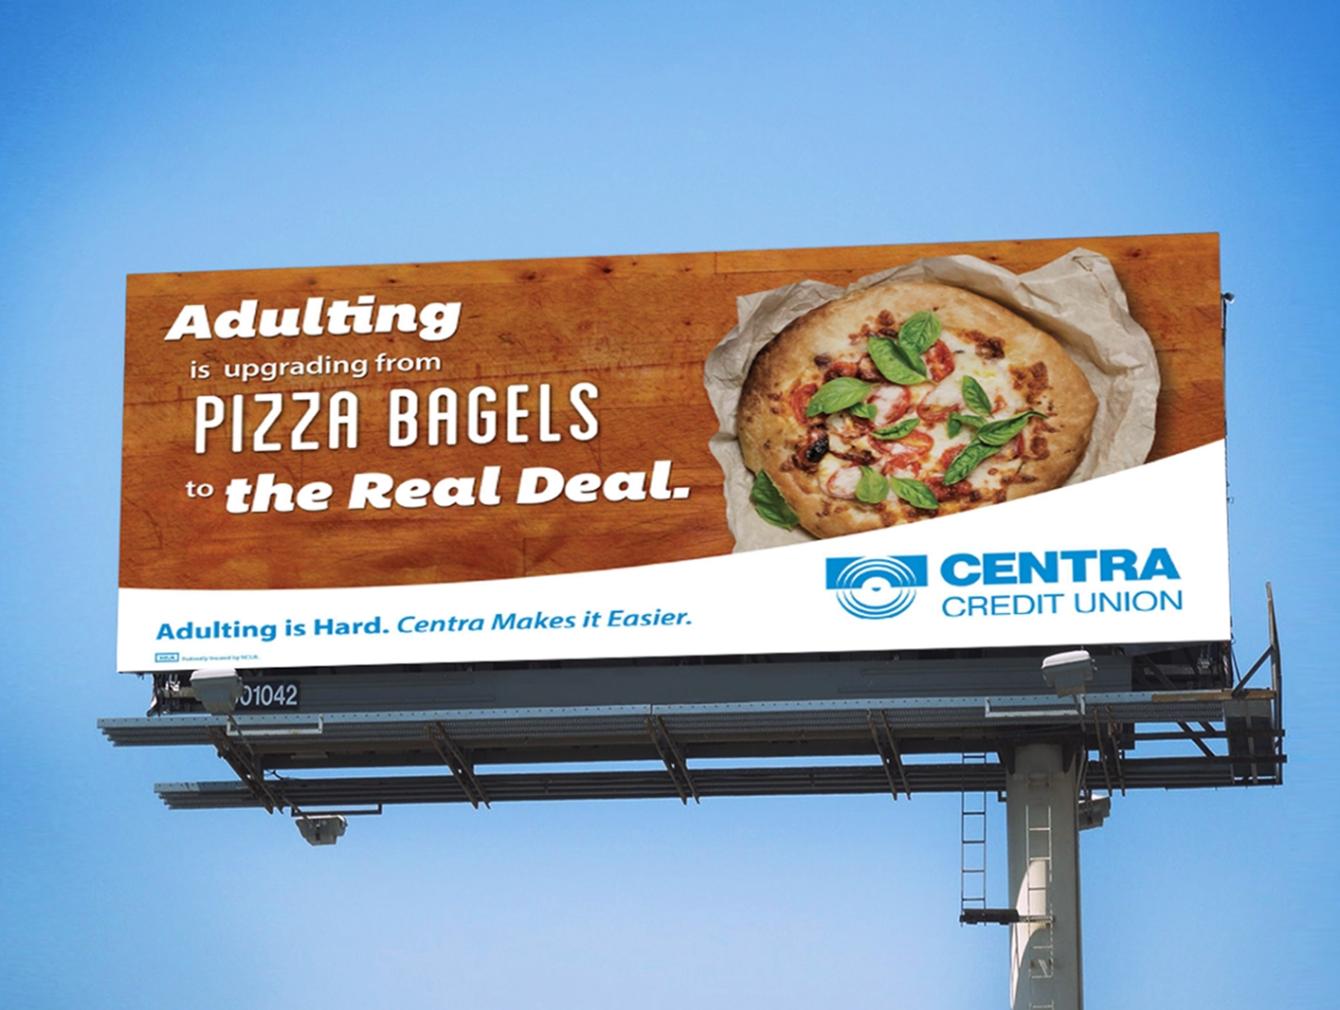 Centra Credit Union billboard featuring pizza.